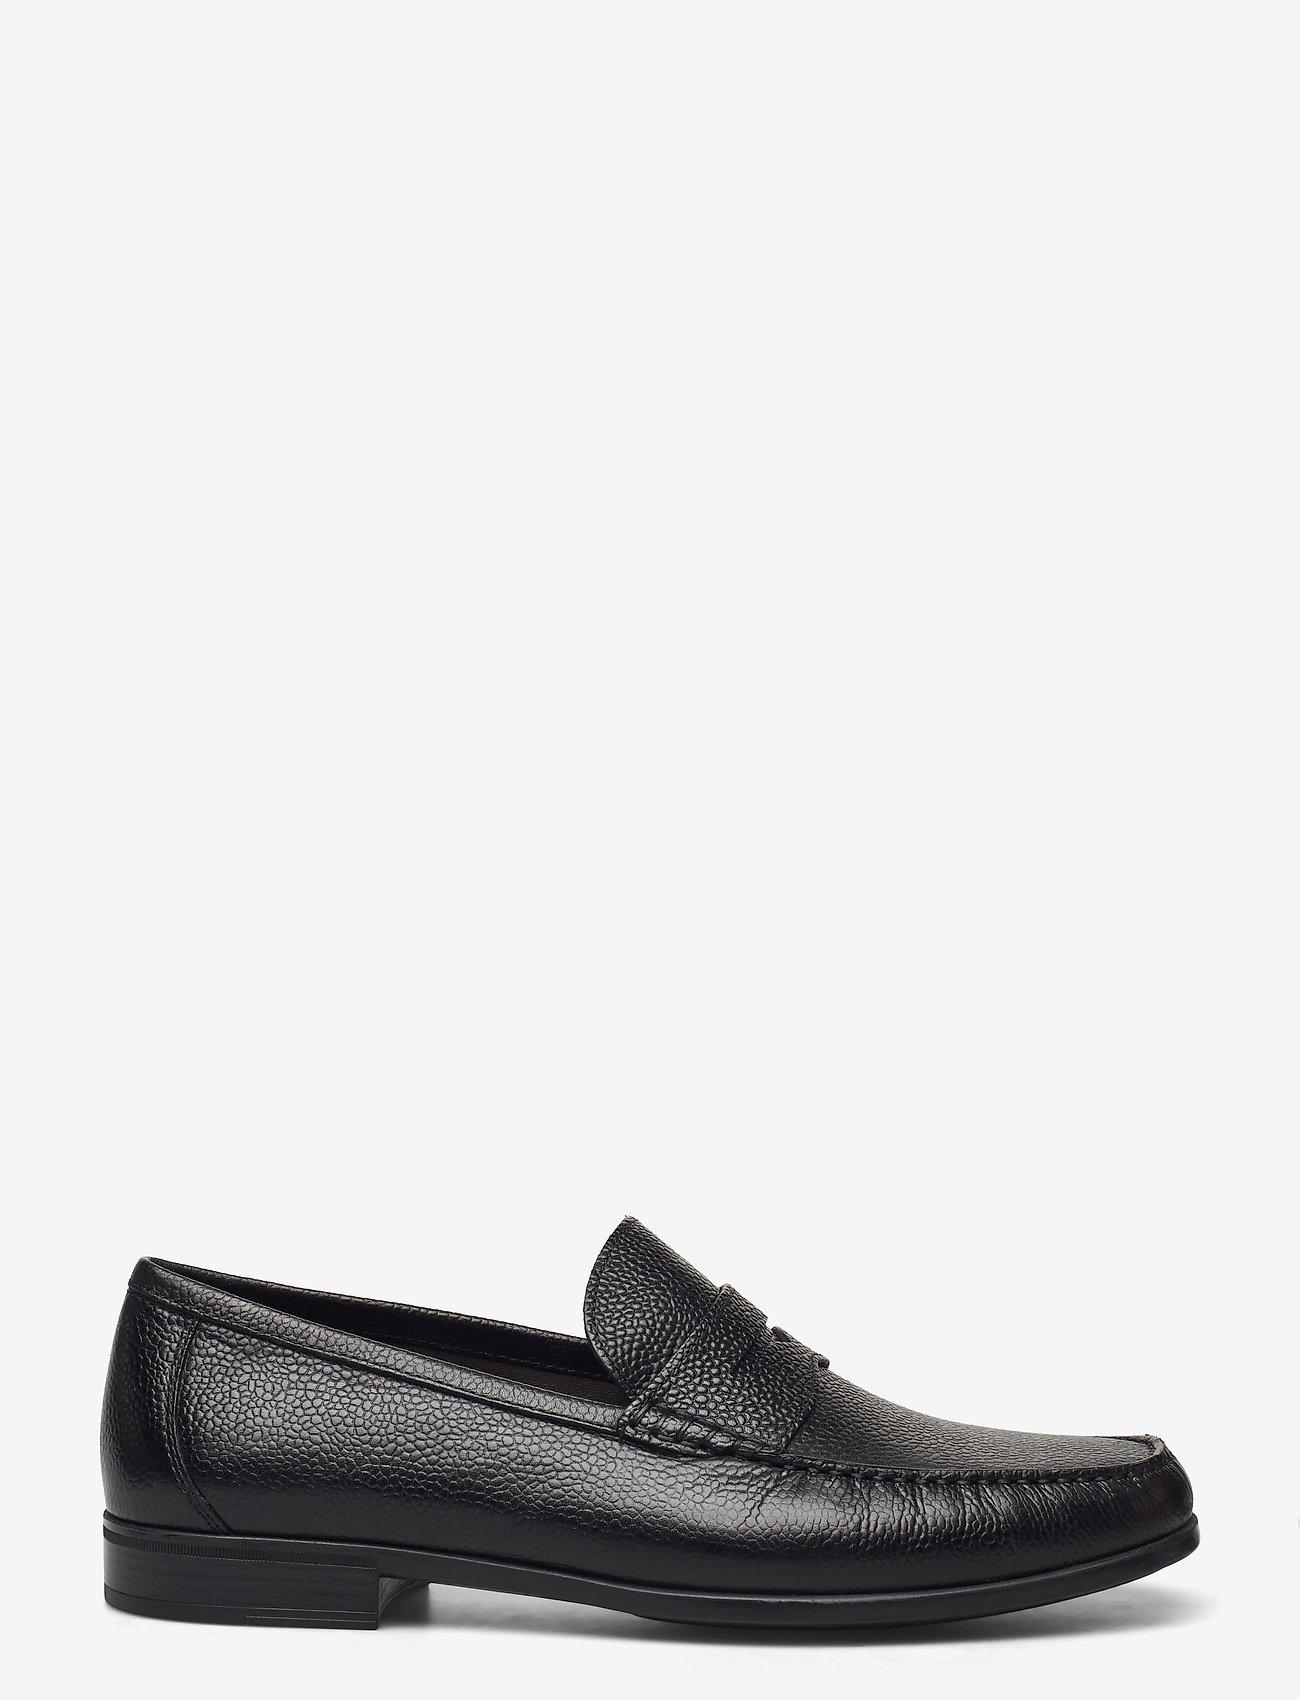 ECCO - DRESS MOC - loafers - black - 1